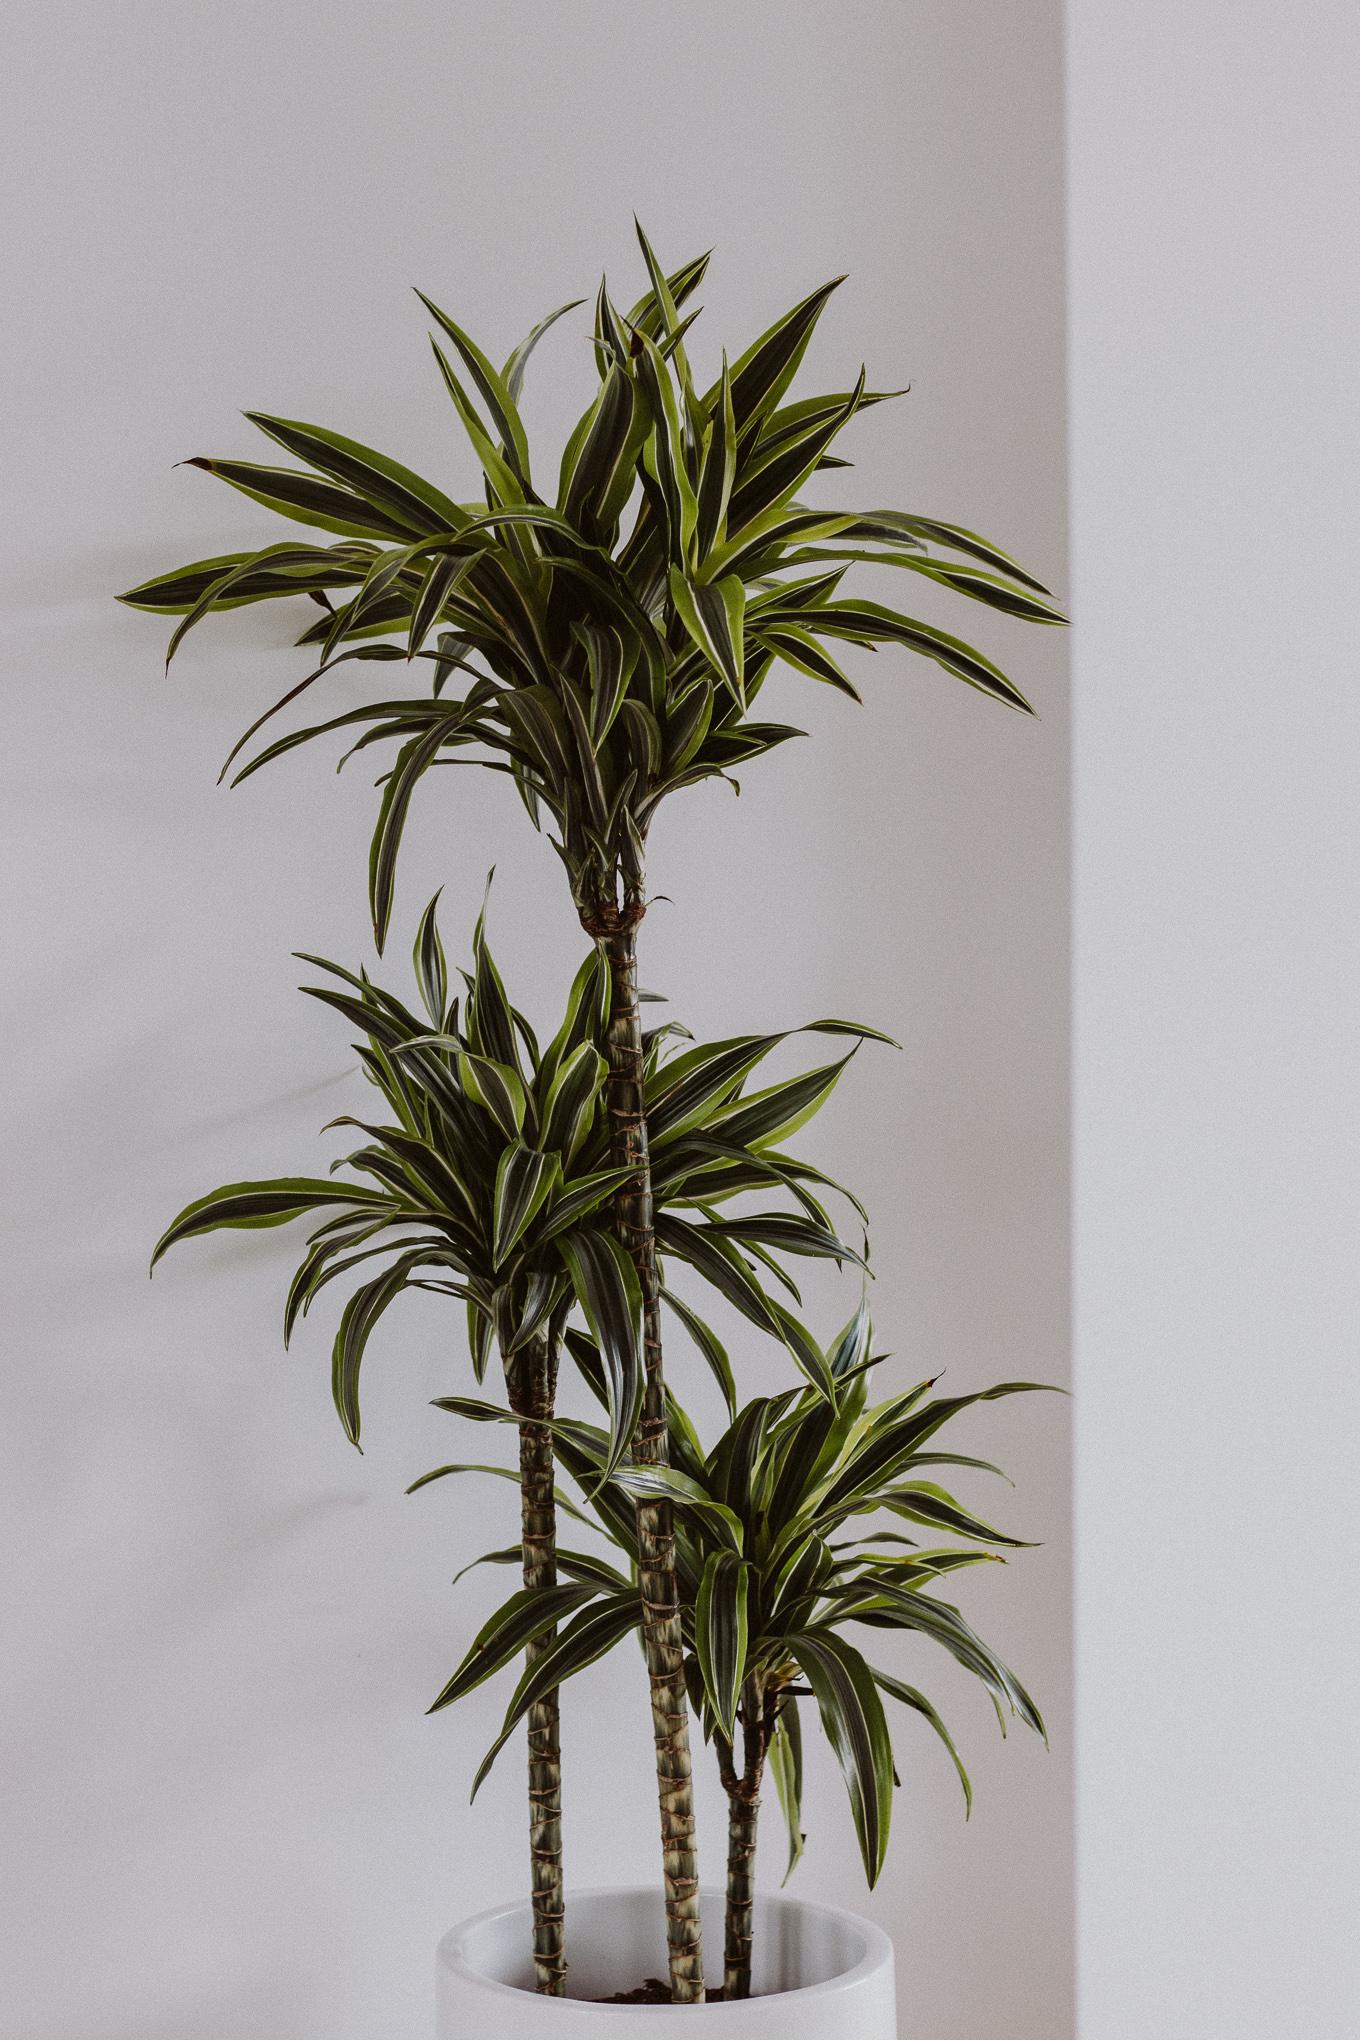 The Daily Dose Pflanzenpflege Yucca Palme